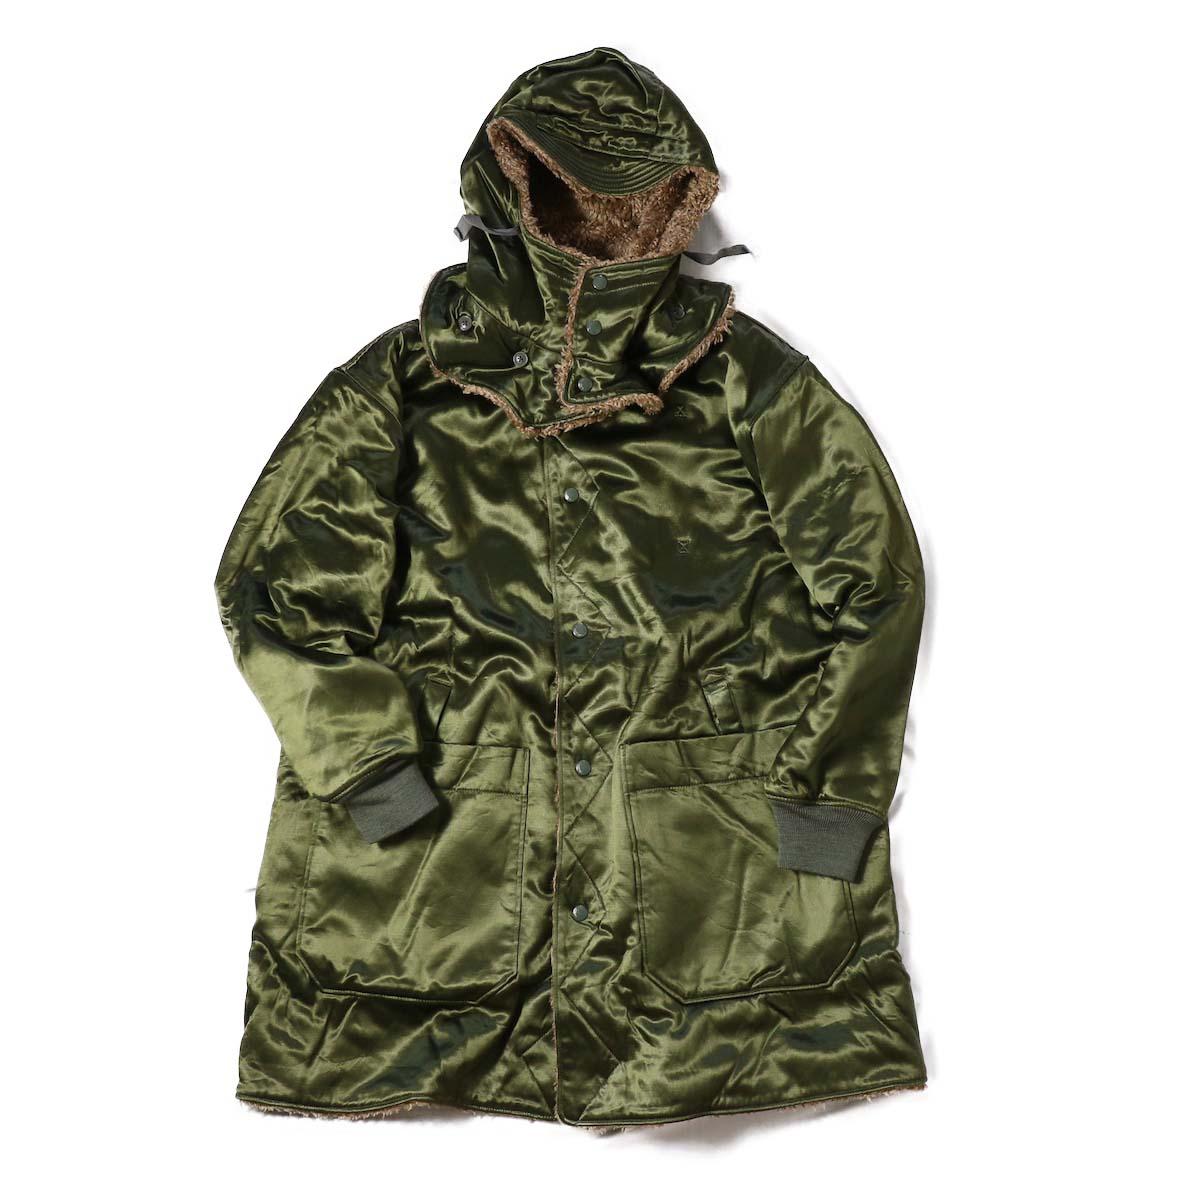 Engineered Garments / Liner Jacket - PC Kasha